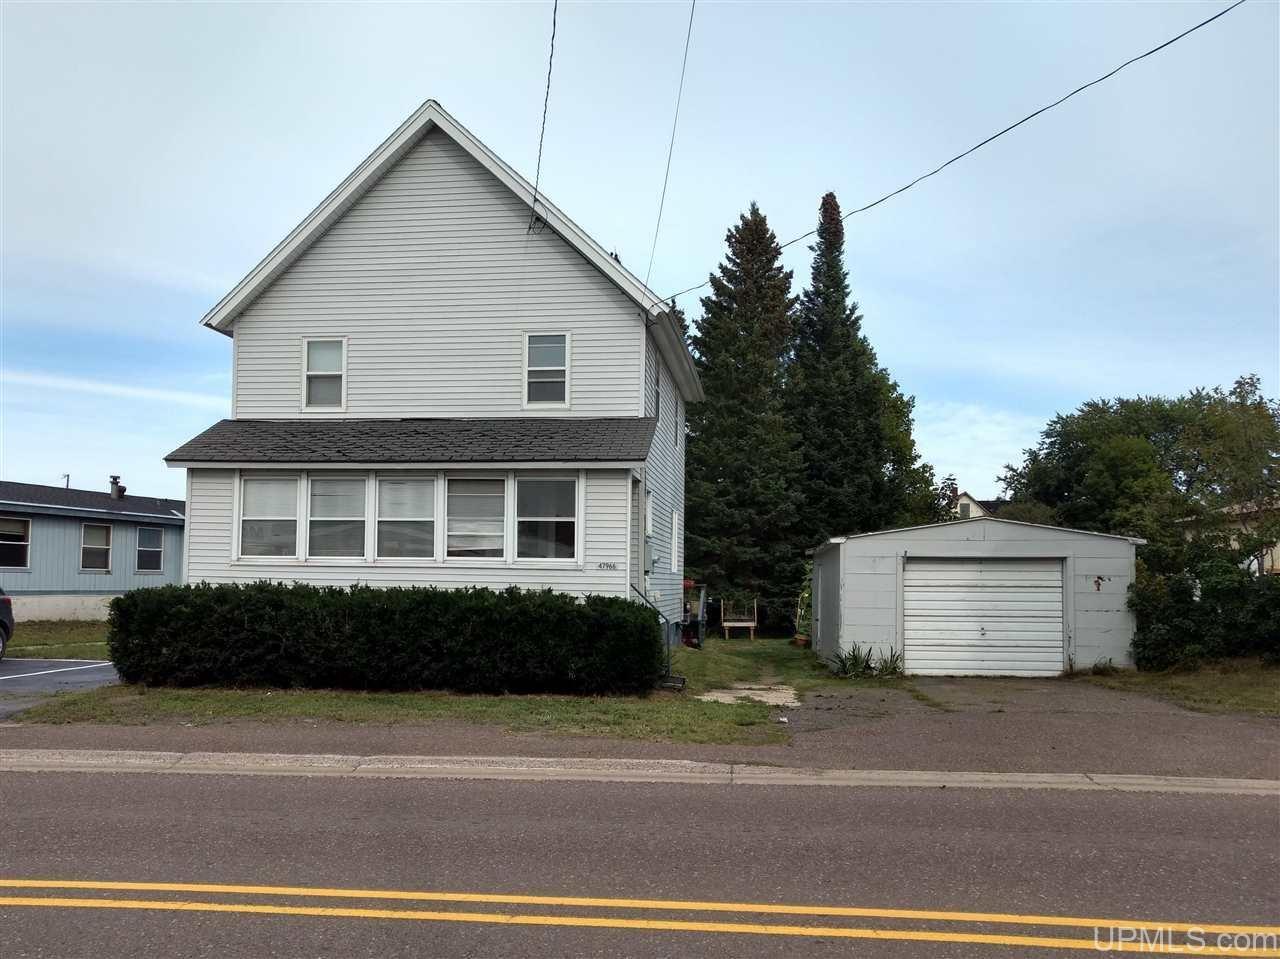 Photo of 47966 Main, Houghton, MI 49931 (MLS # 1129939)